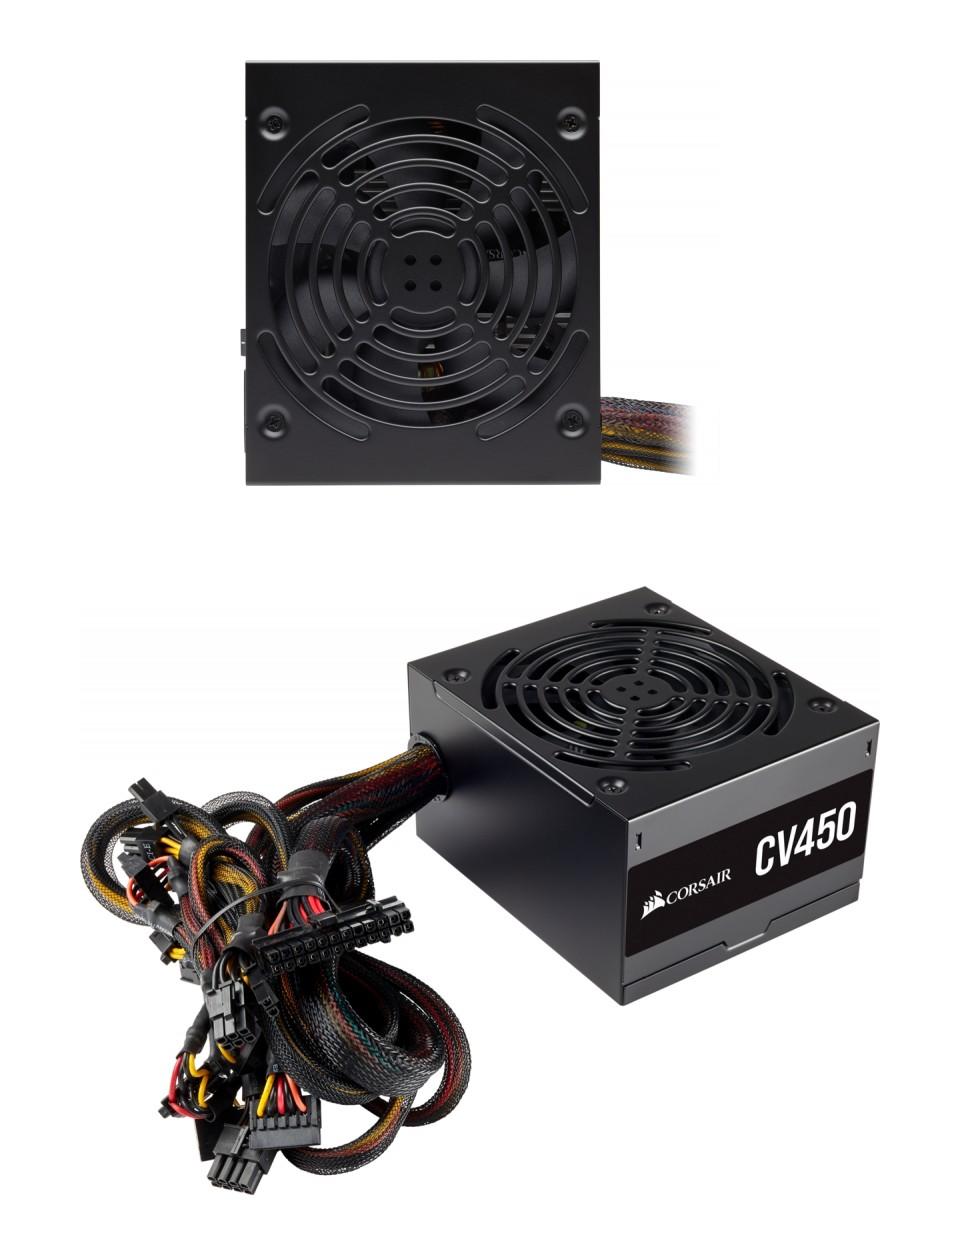 Corsair CV450 450W Power Supply product